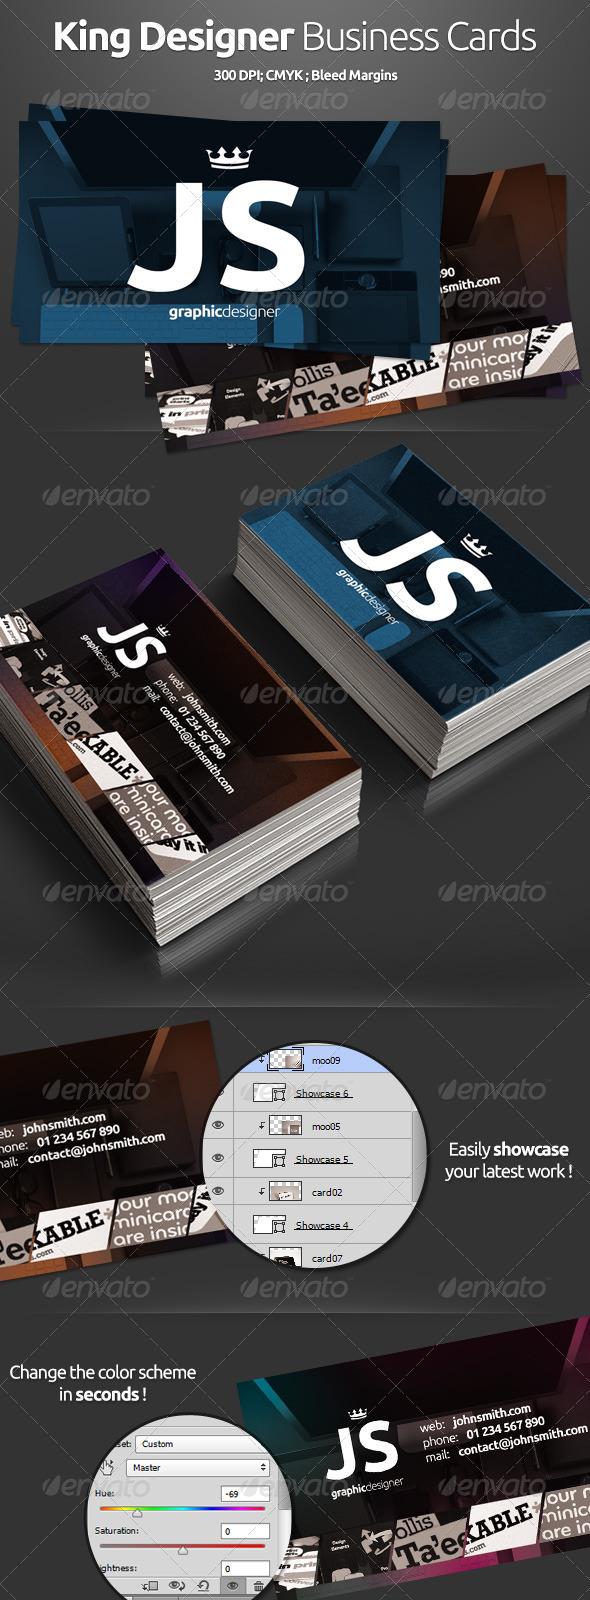 GraphicRiver King Designer Business Cards 5419412